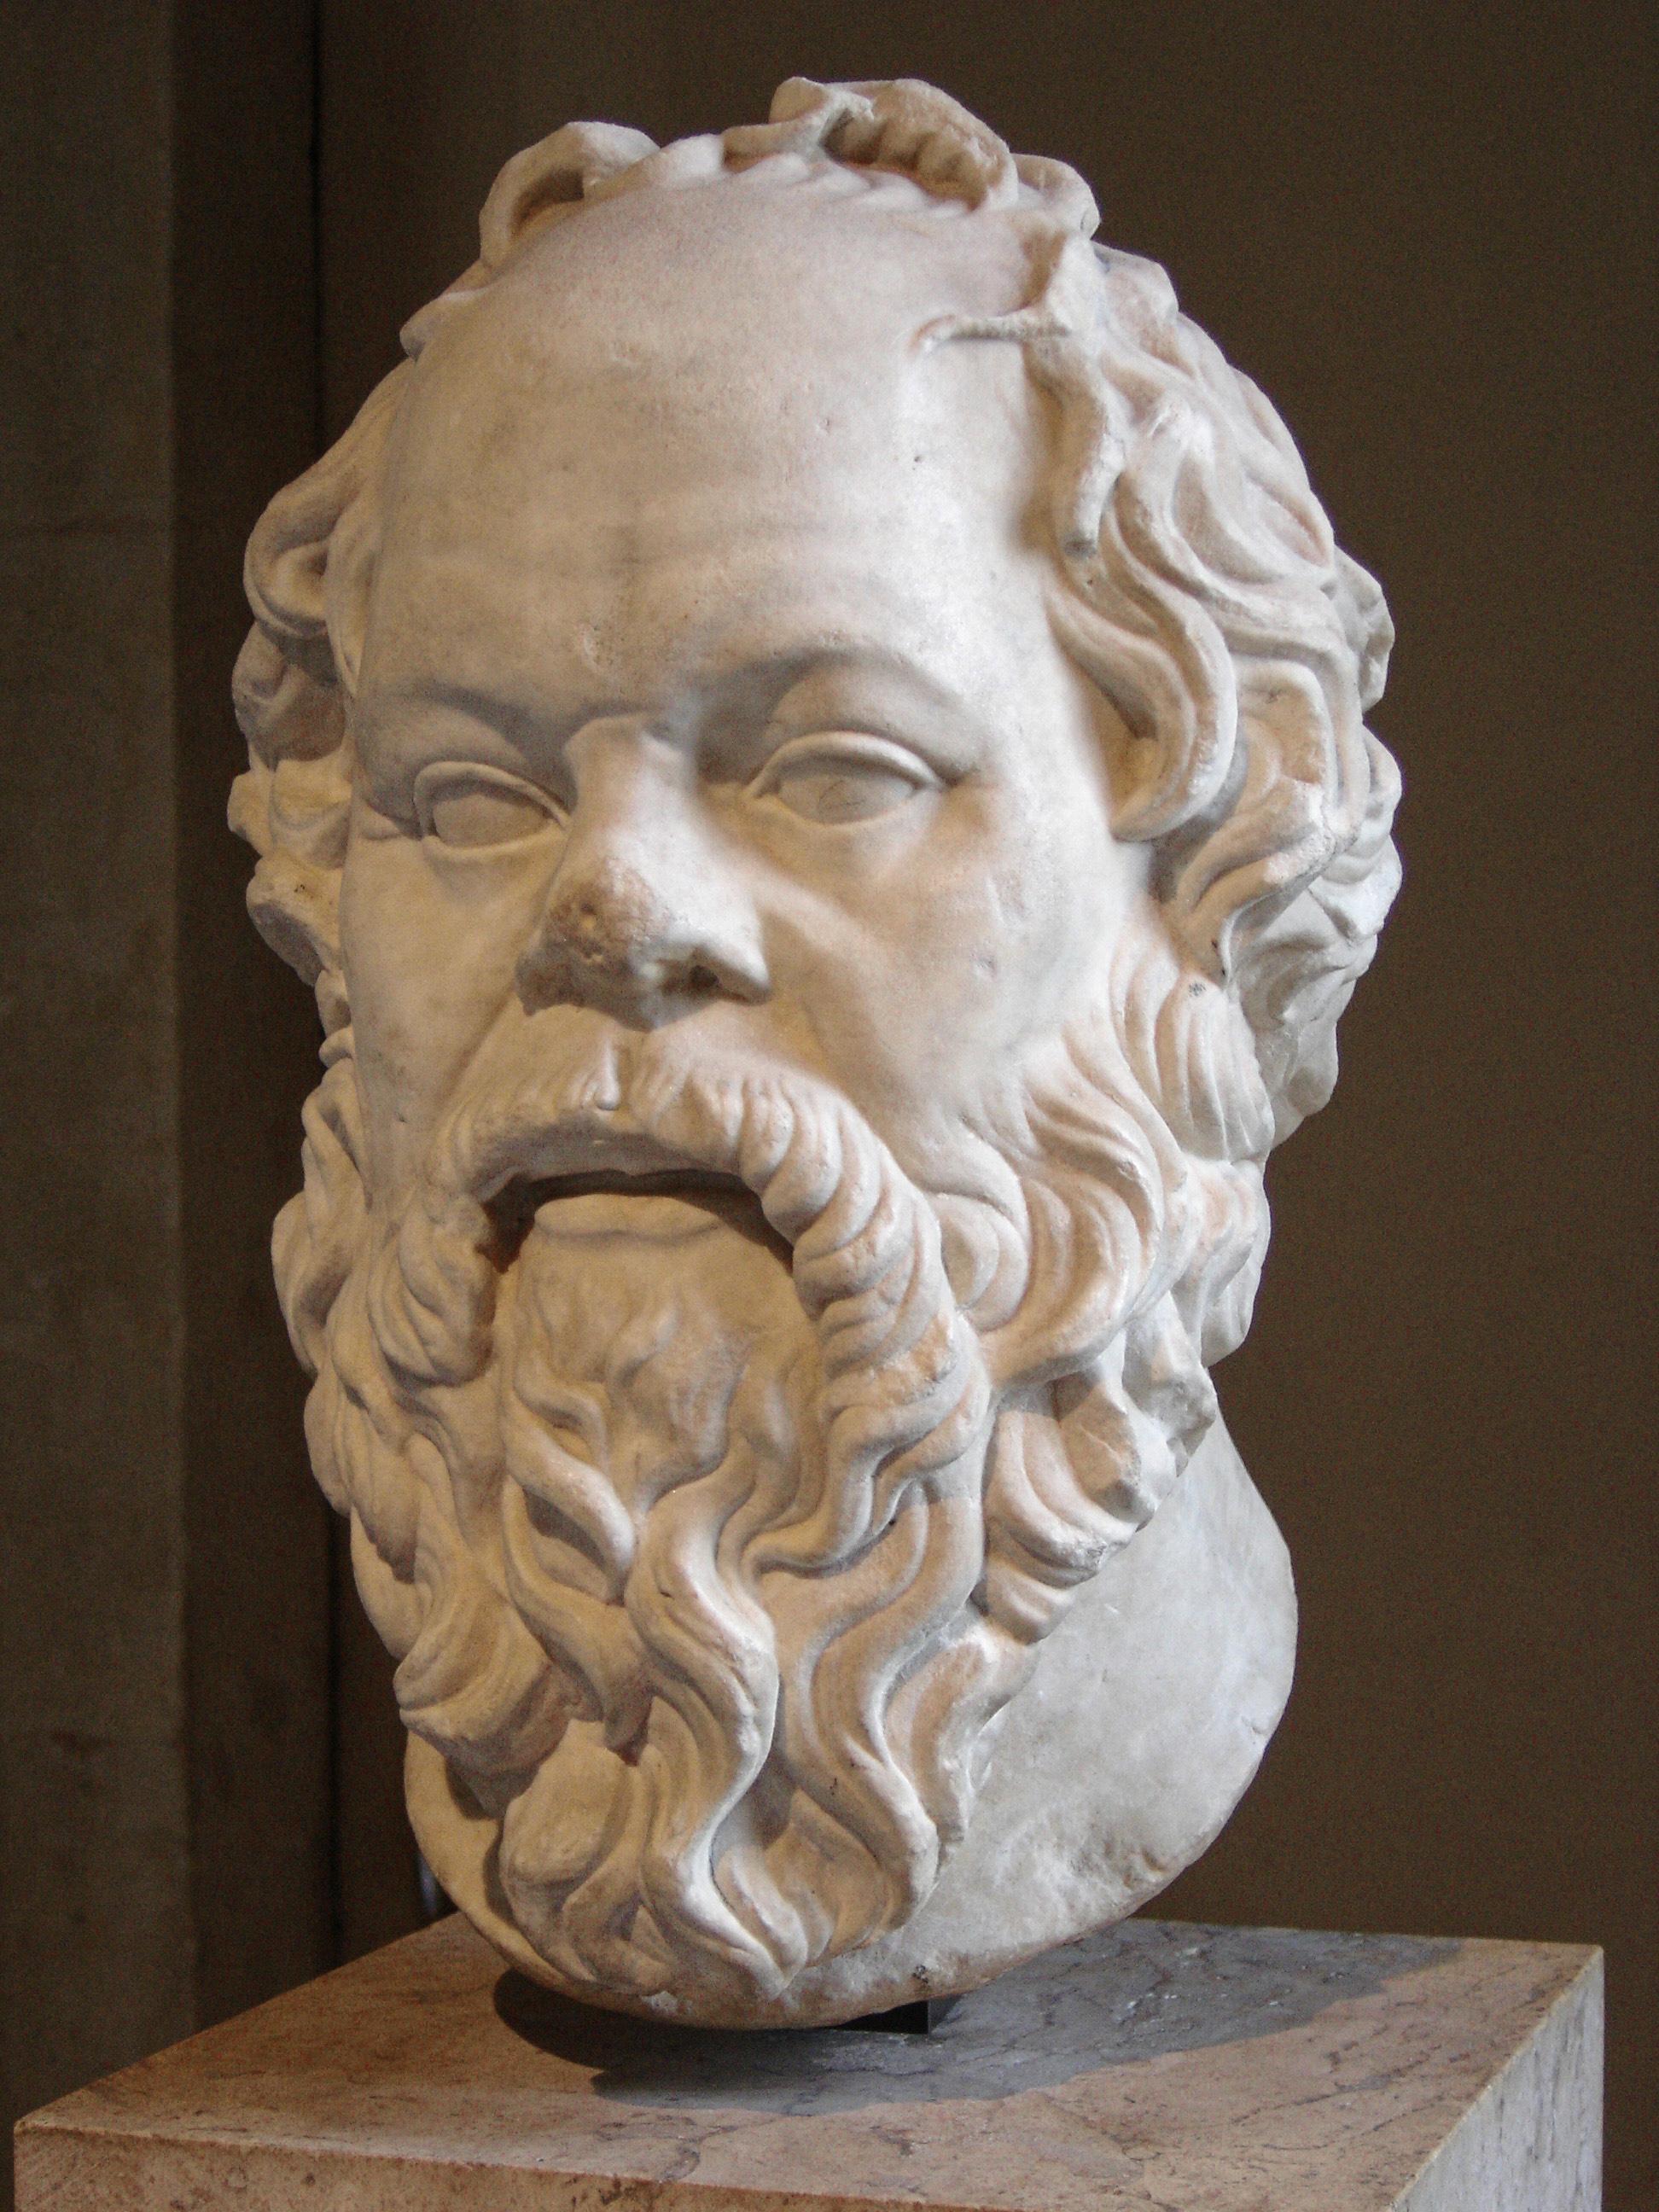 Portrait of Socrates. Marble, Roman artwork (1st century).